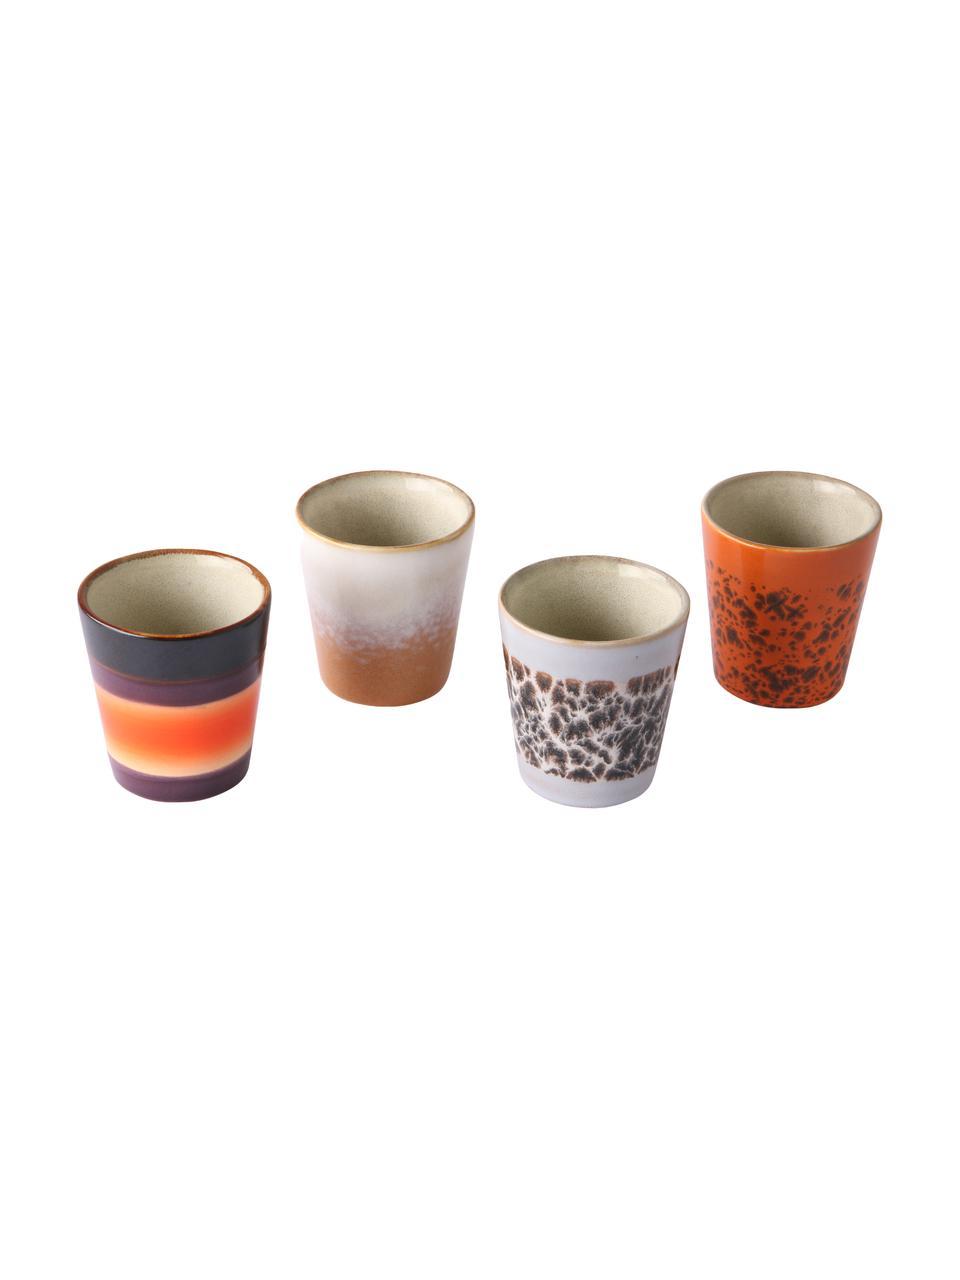 Handgemaakte espressokopjesset 70's in retro stijl, 4-delig, Keramiek, Multicolour, Ø 6 x H 6 cm